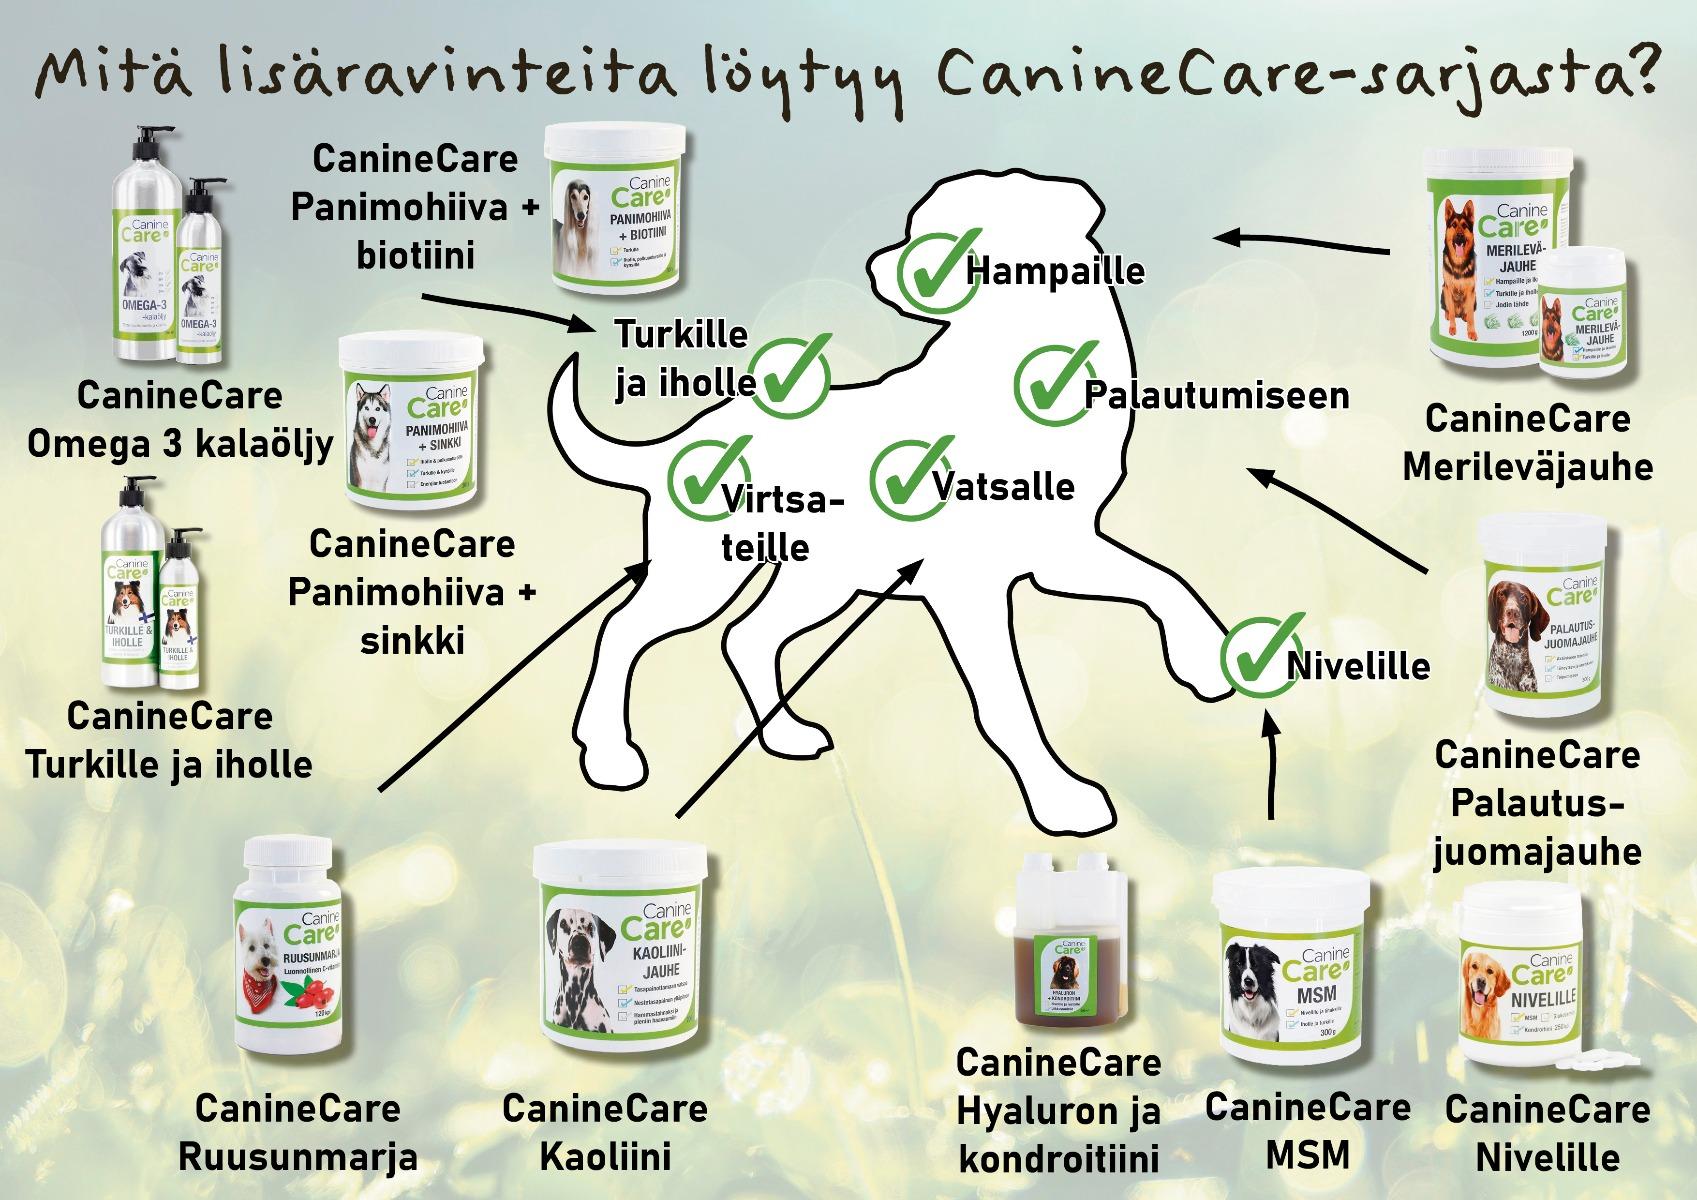 CanineCare-tuoteperhe